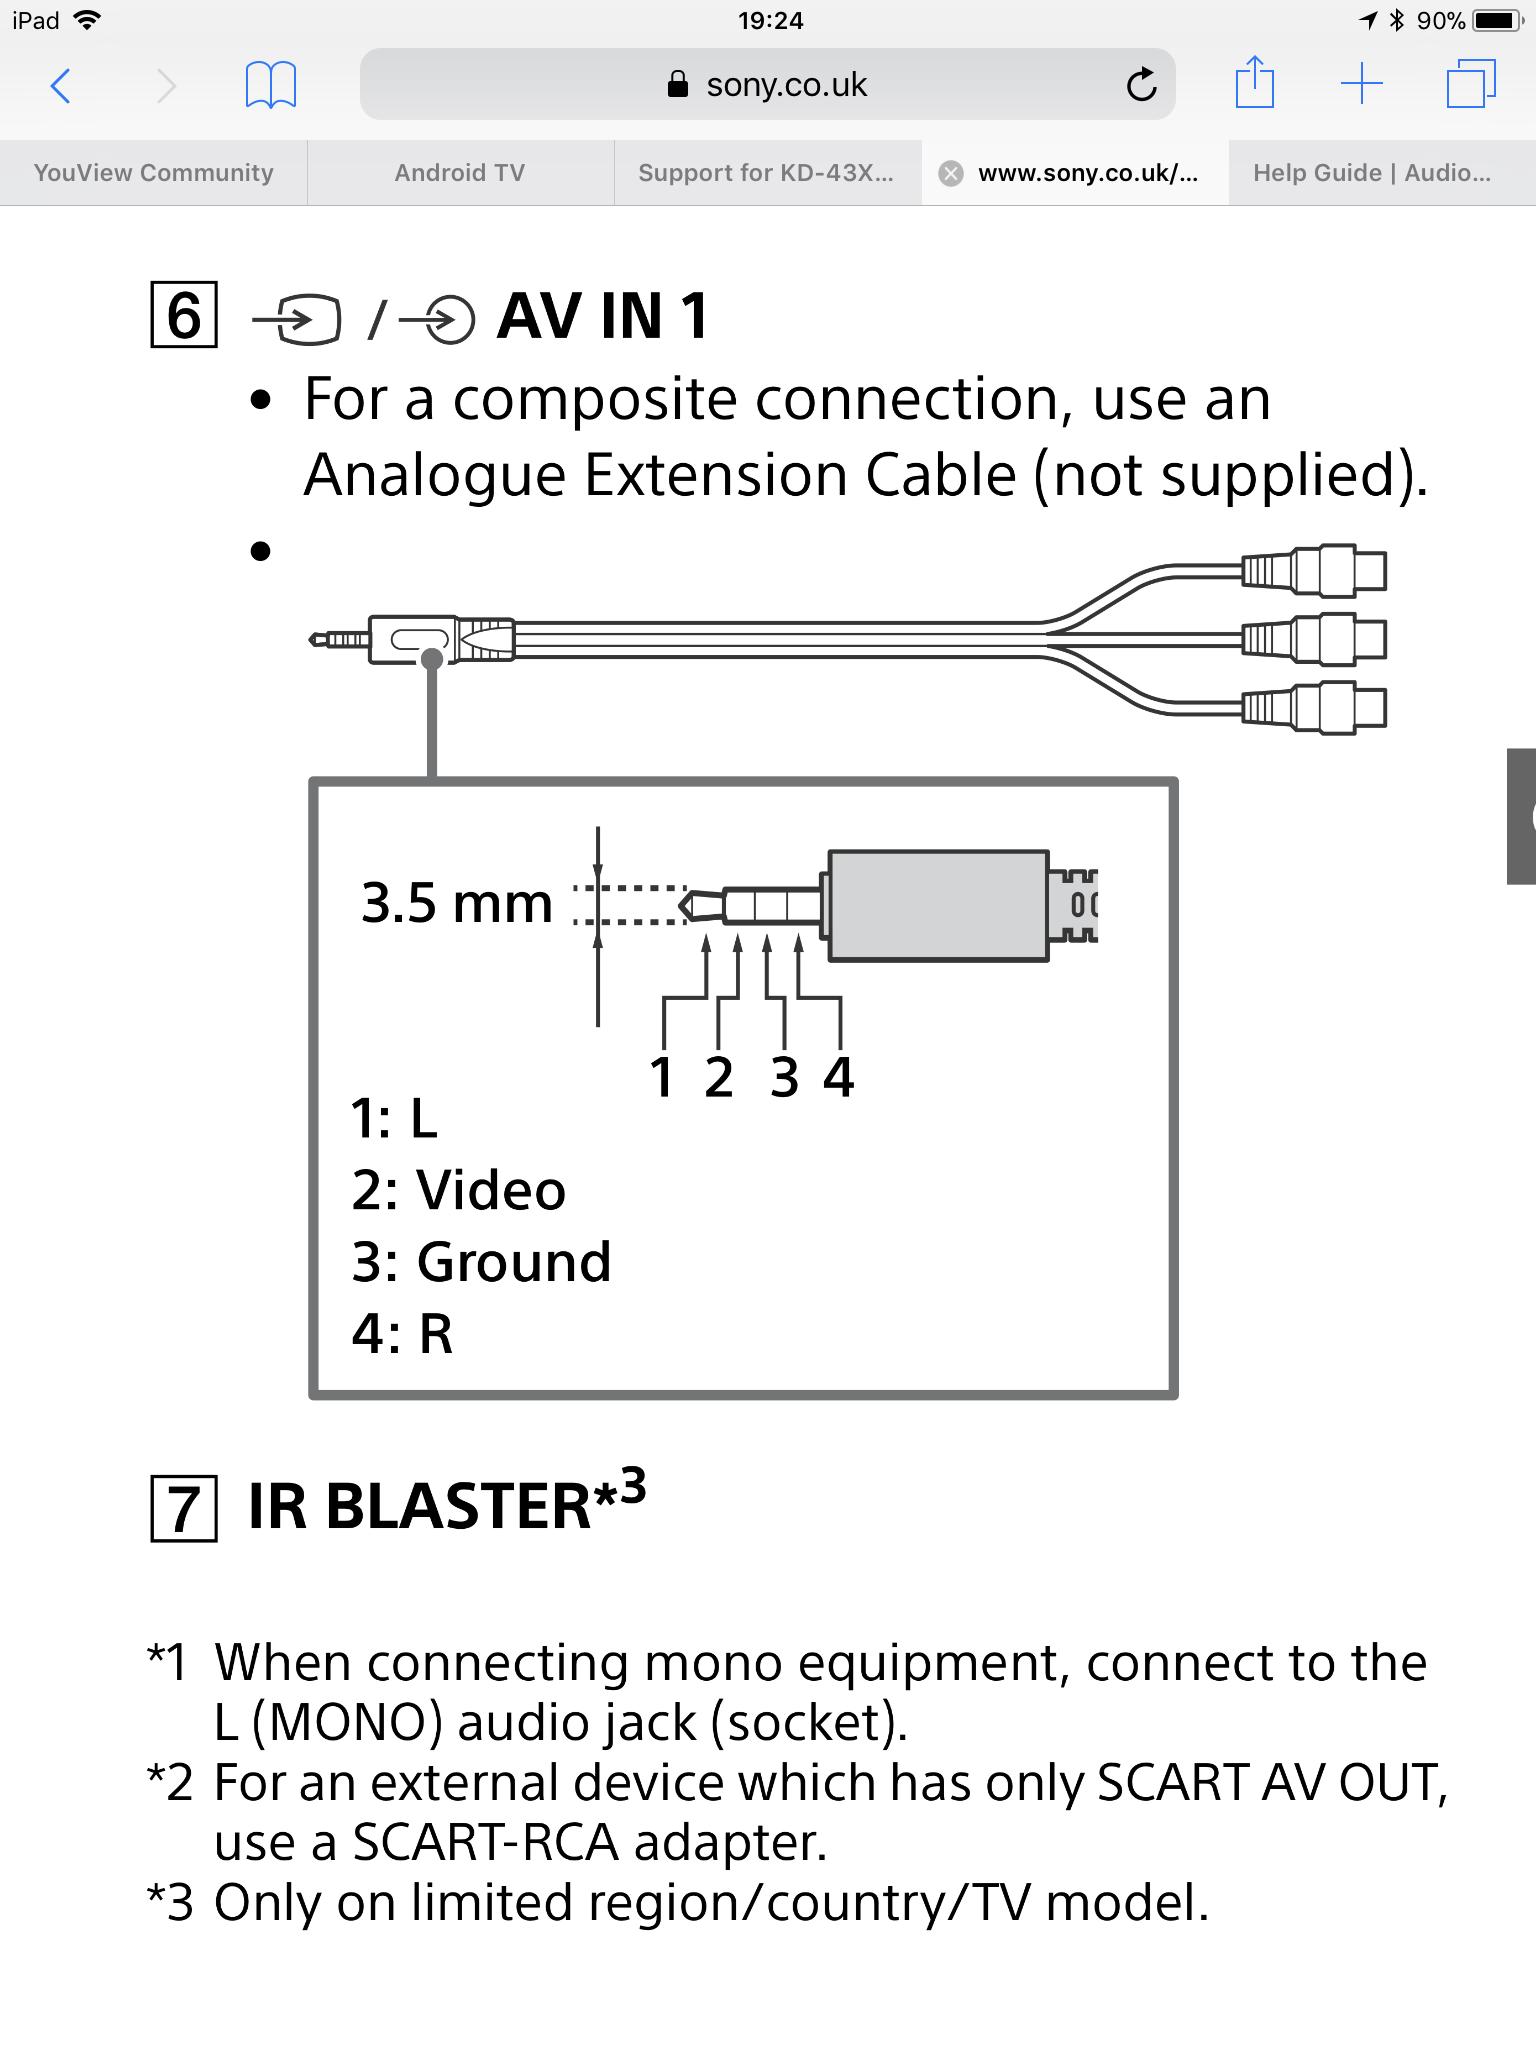 Analog Av Adapter For Composite Input On A Sony Br 1 4 Jack Wiring Dd555516 228b 475d Bd27 C1b6d9189528